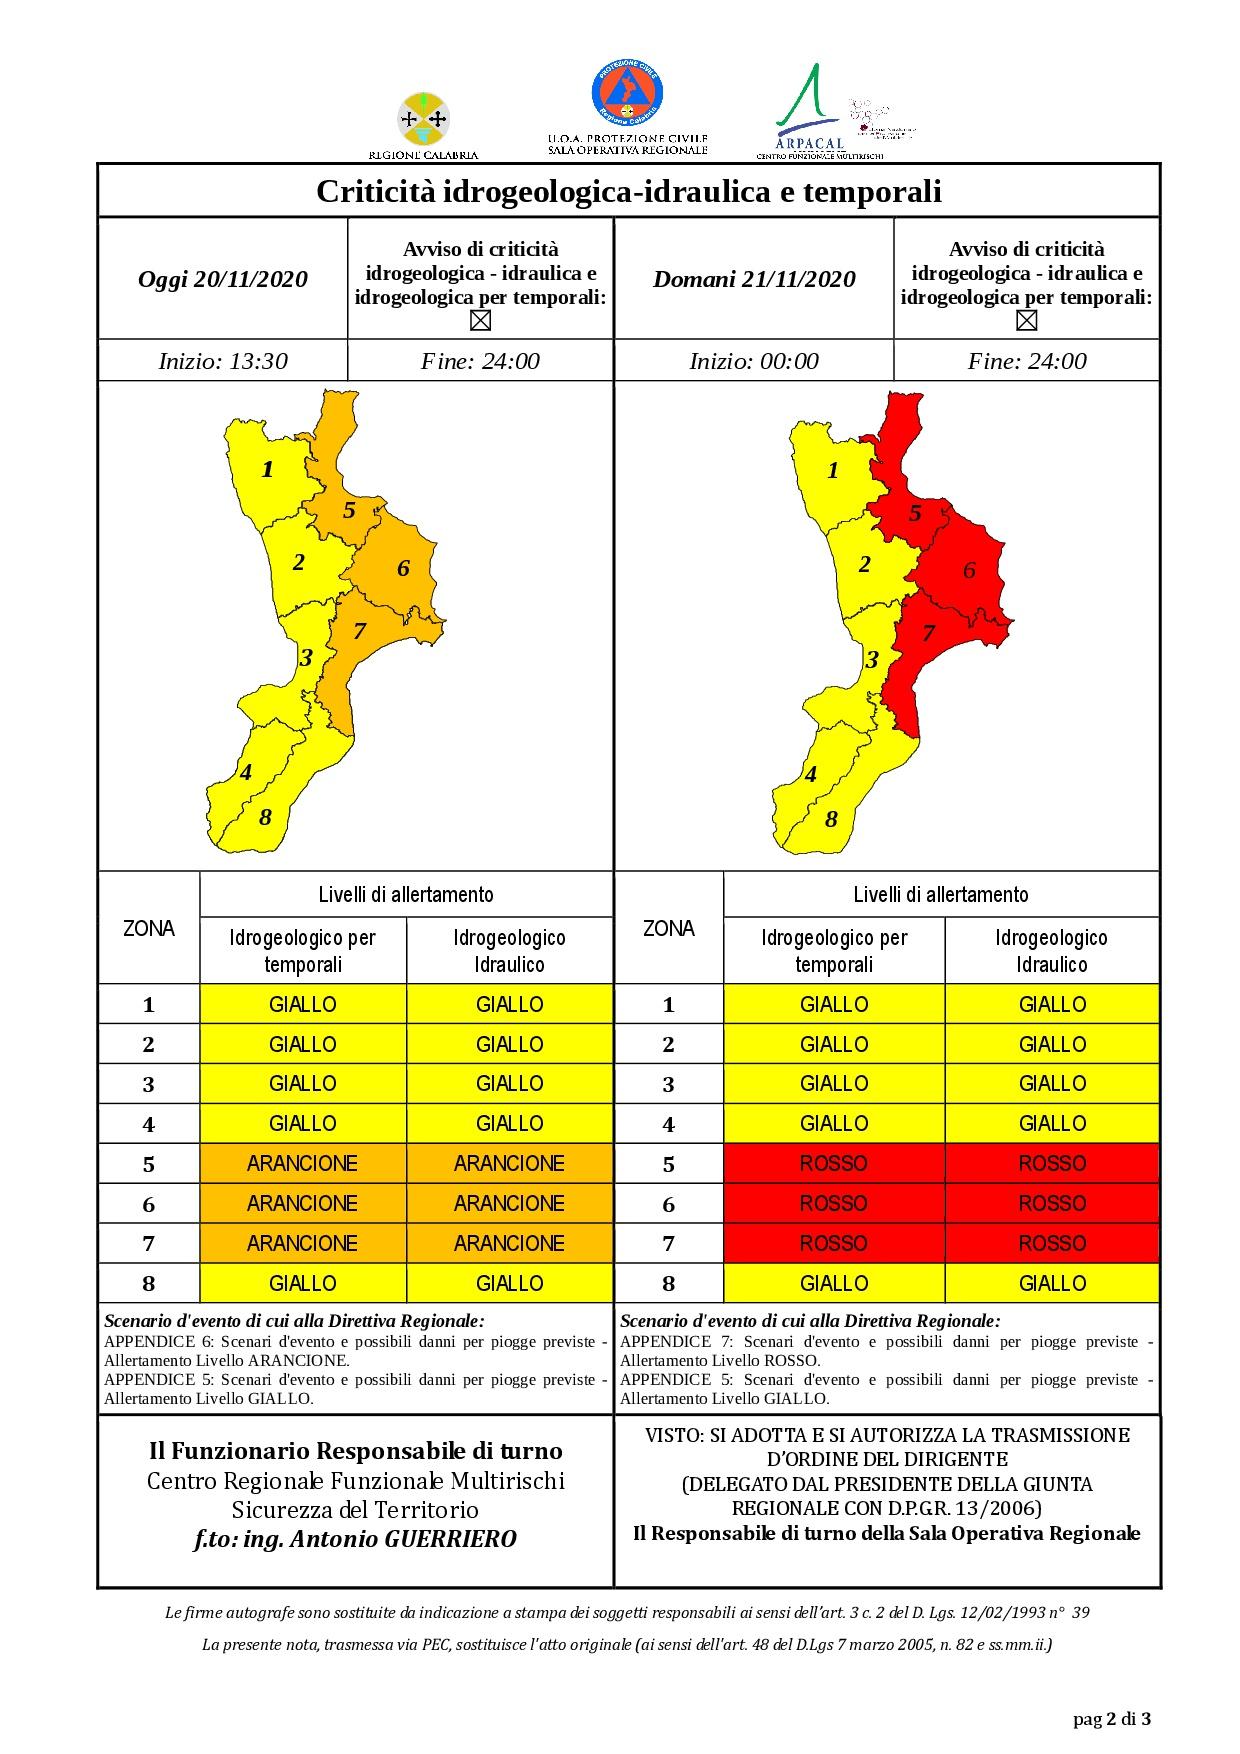 Criticità idrogeologica-idraulica e temporali in Calabria 20-11-2020